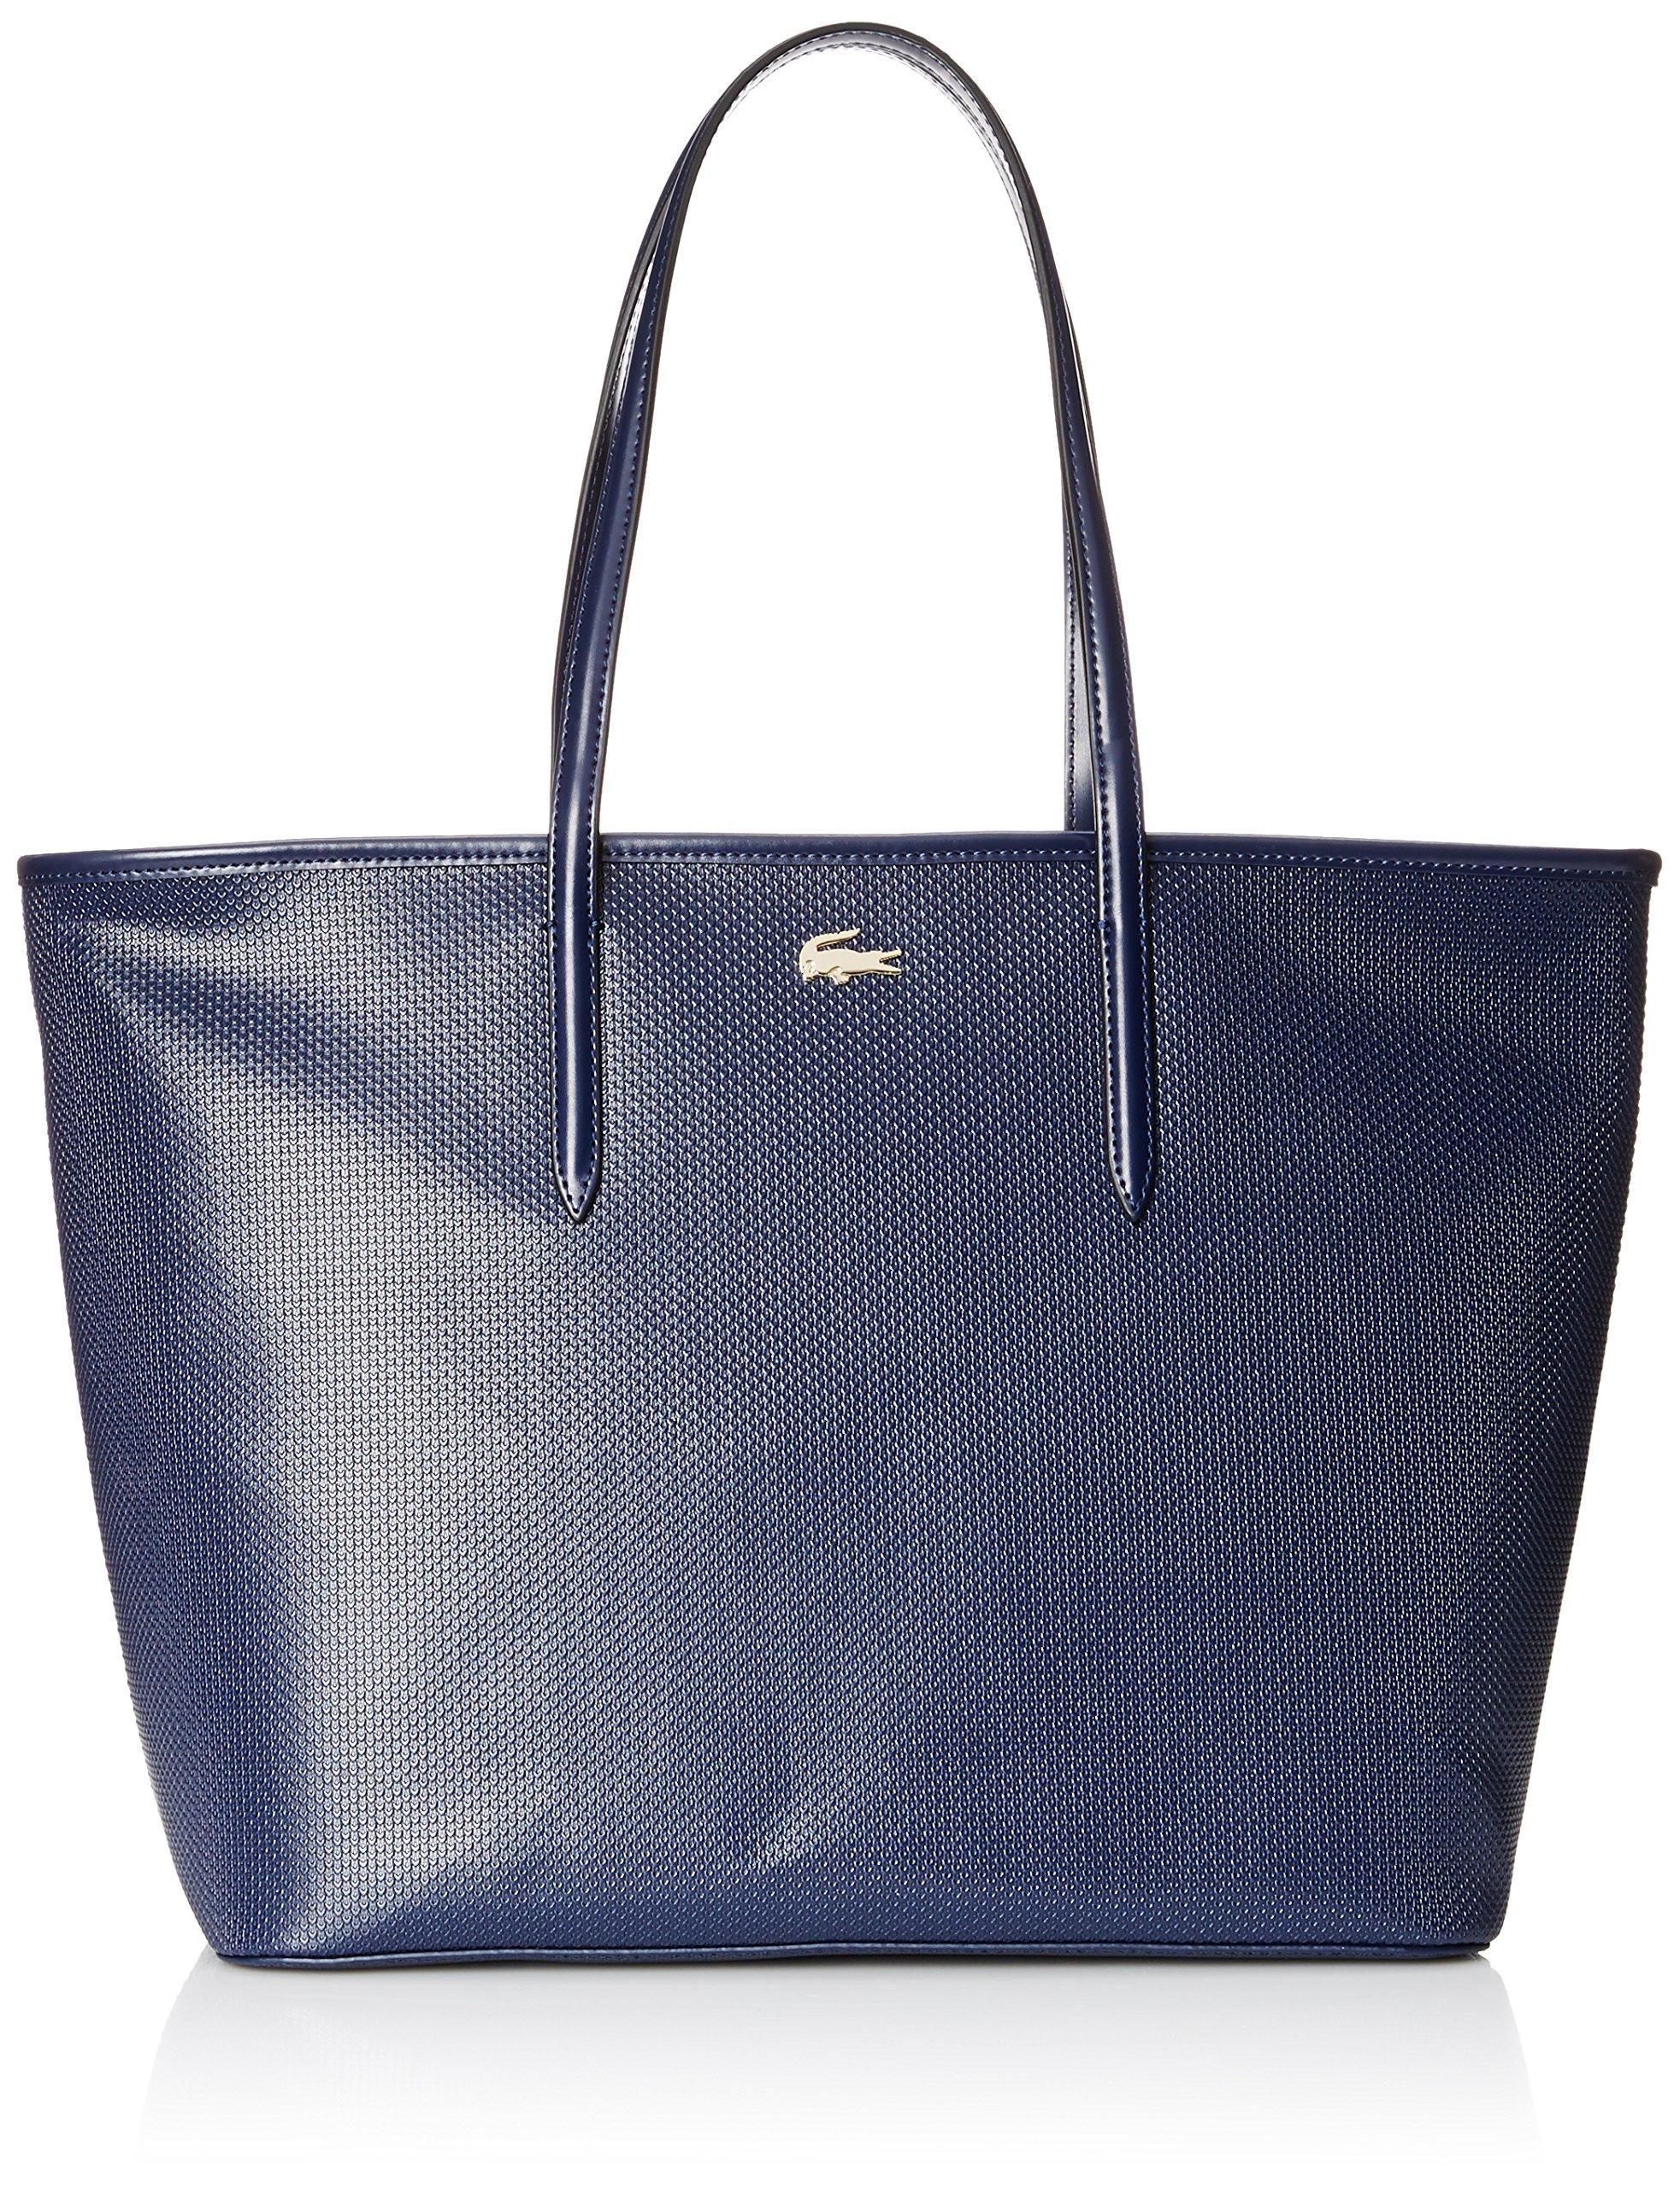 Lacoste Women's Chantaco Medium Tote Shoulder Bag, Peacoat, One Size